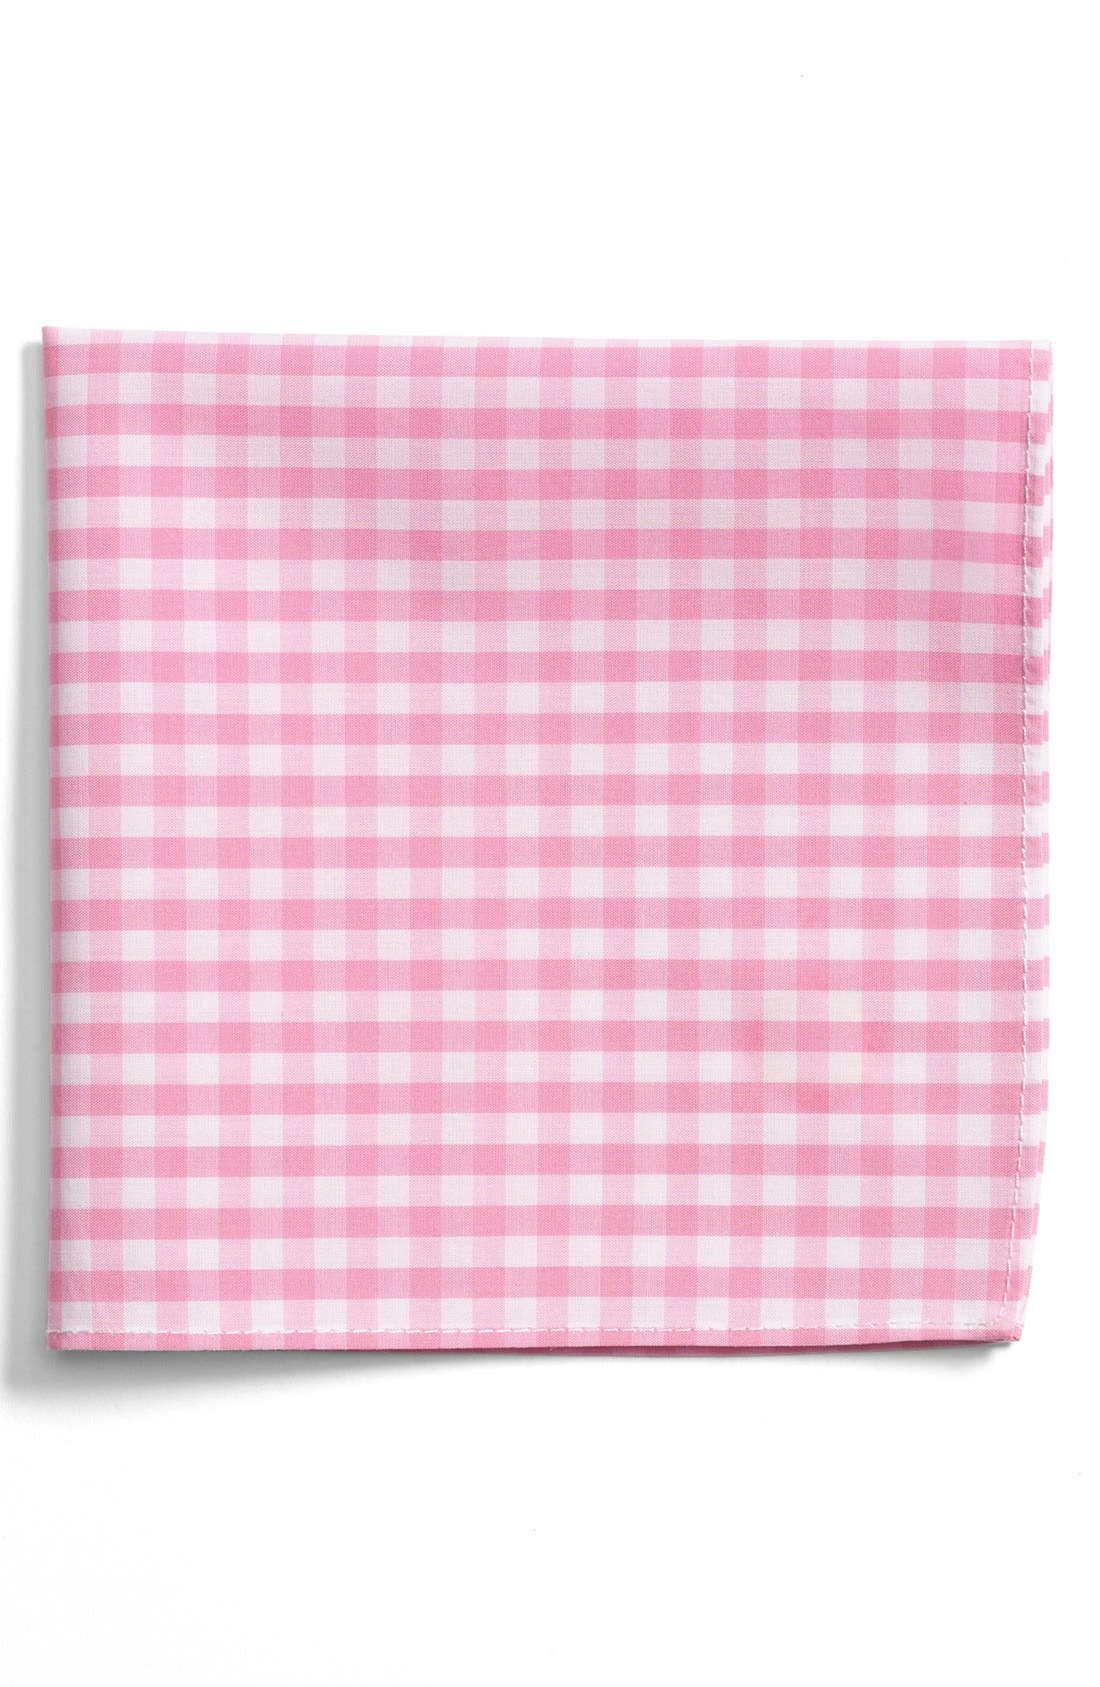 Gingham Cotton Pocket Square,                         Main,                         color, Pink